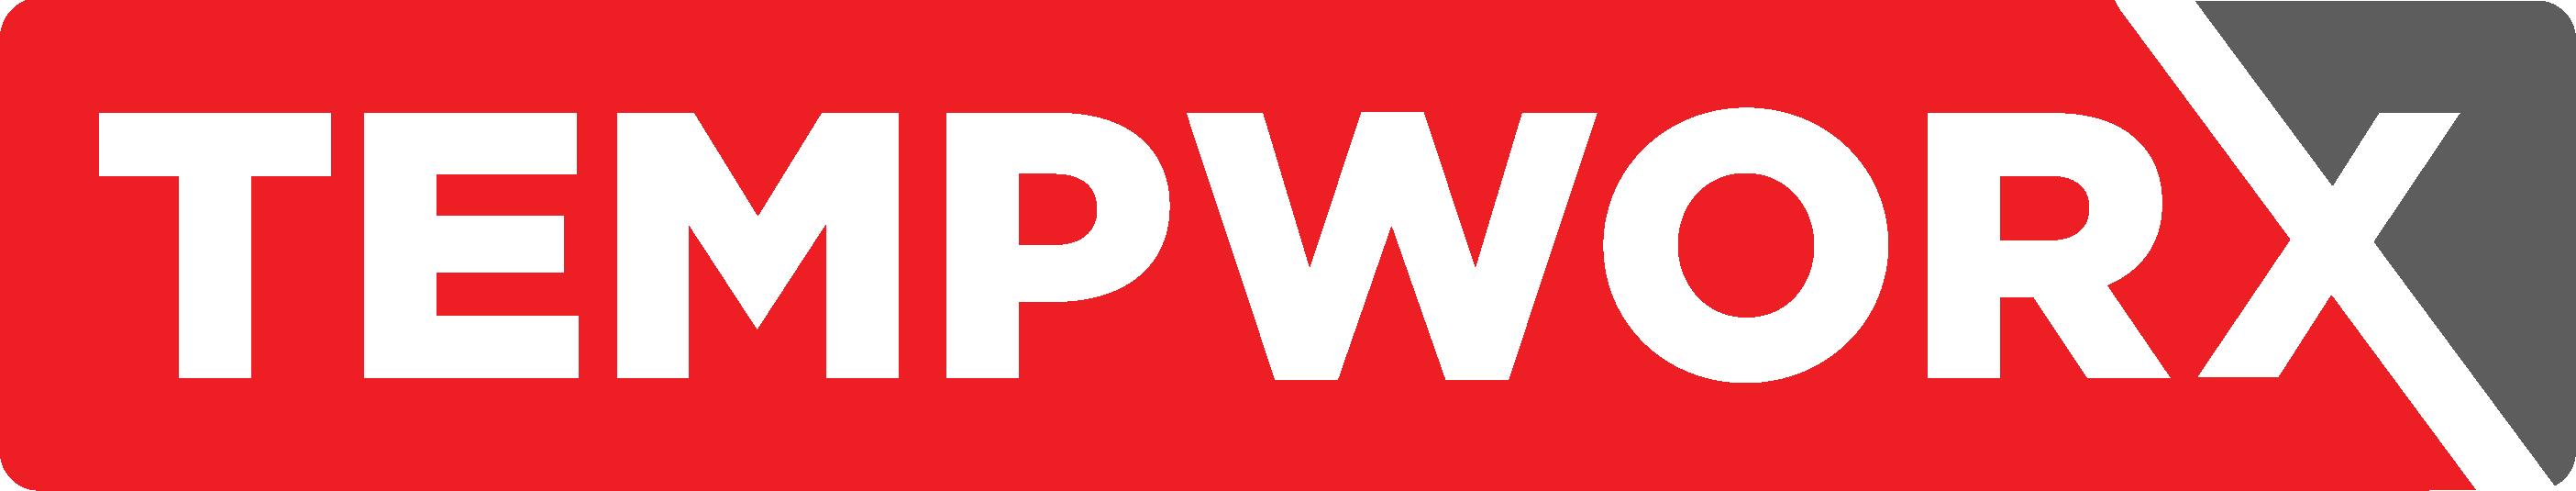 image of tempworx logo